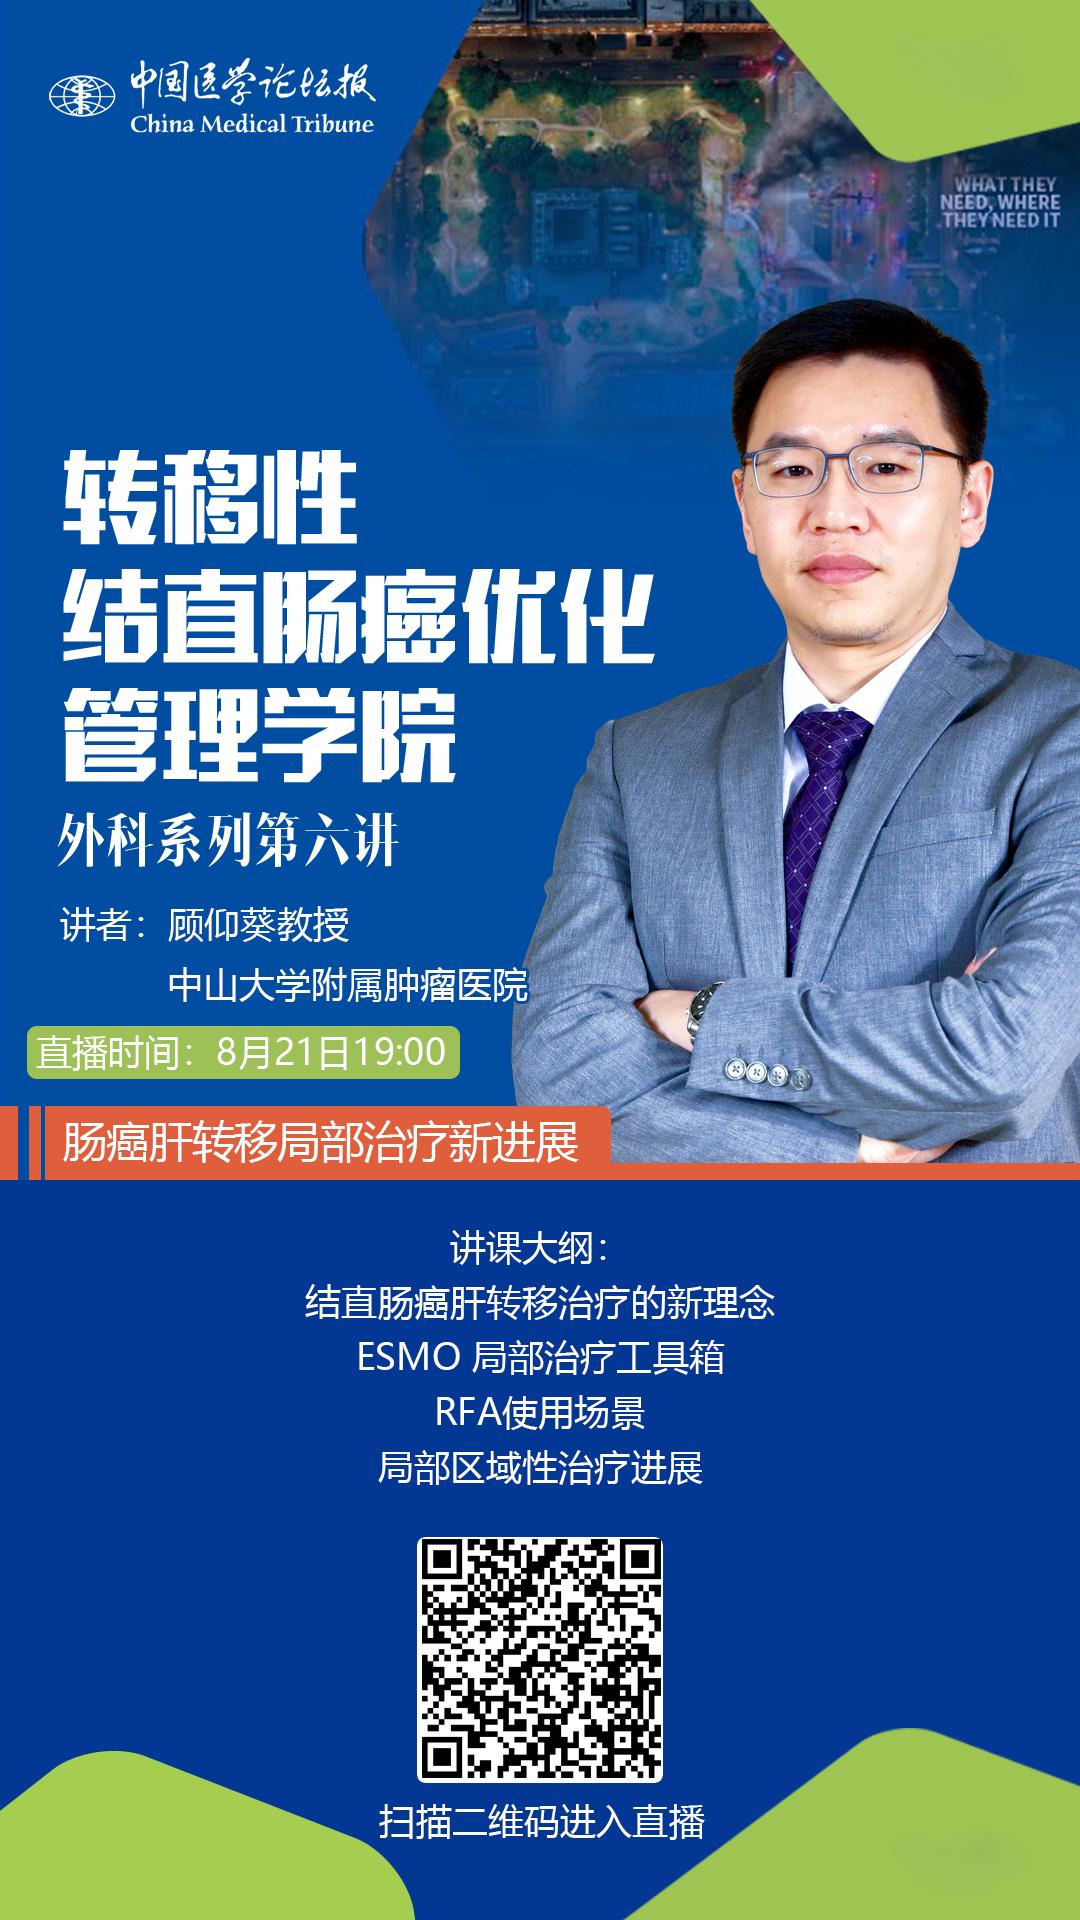 12-gu教授-ps文件-外科5海报(1).png